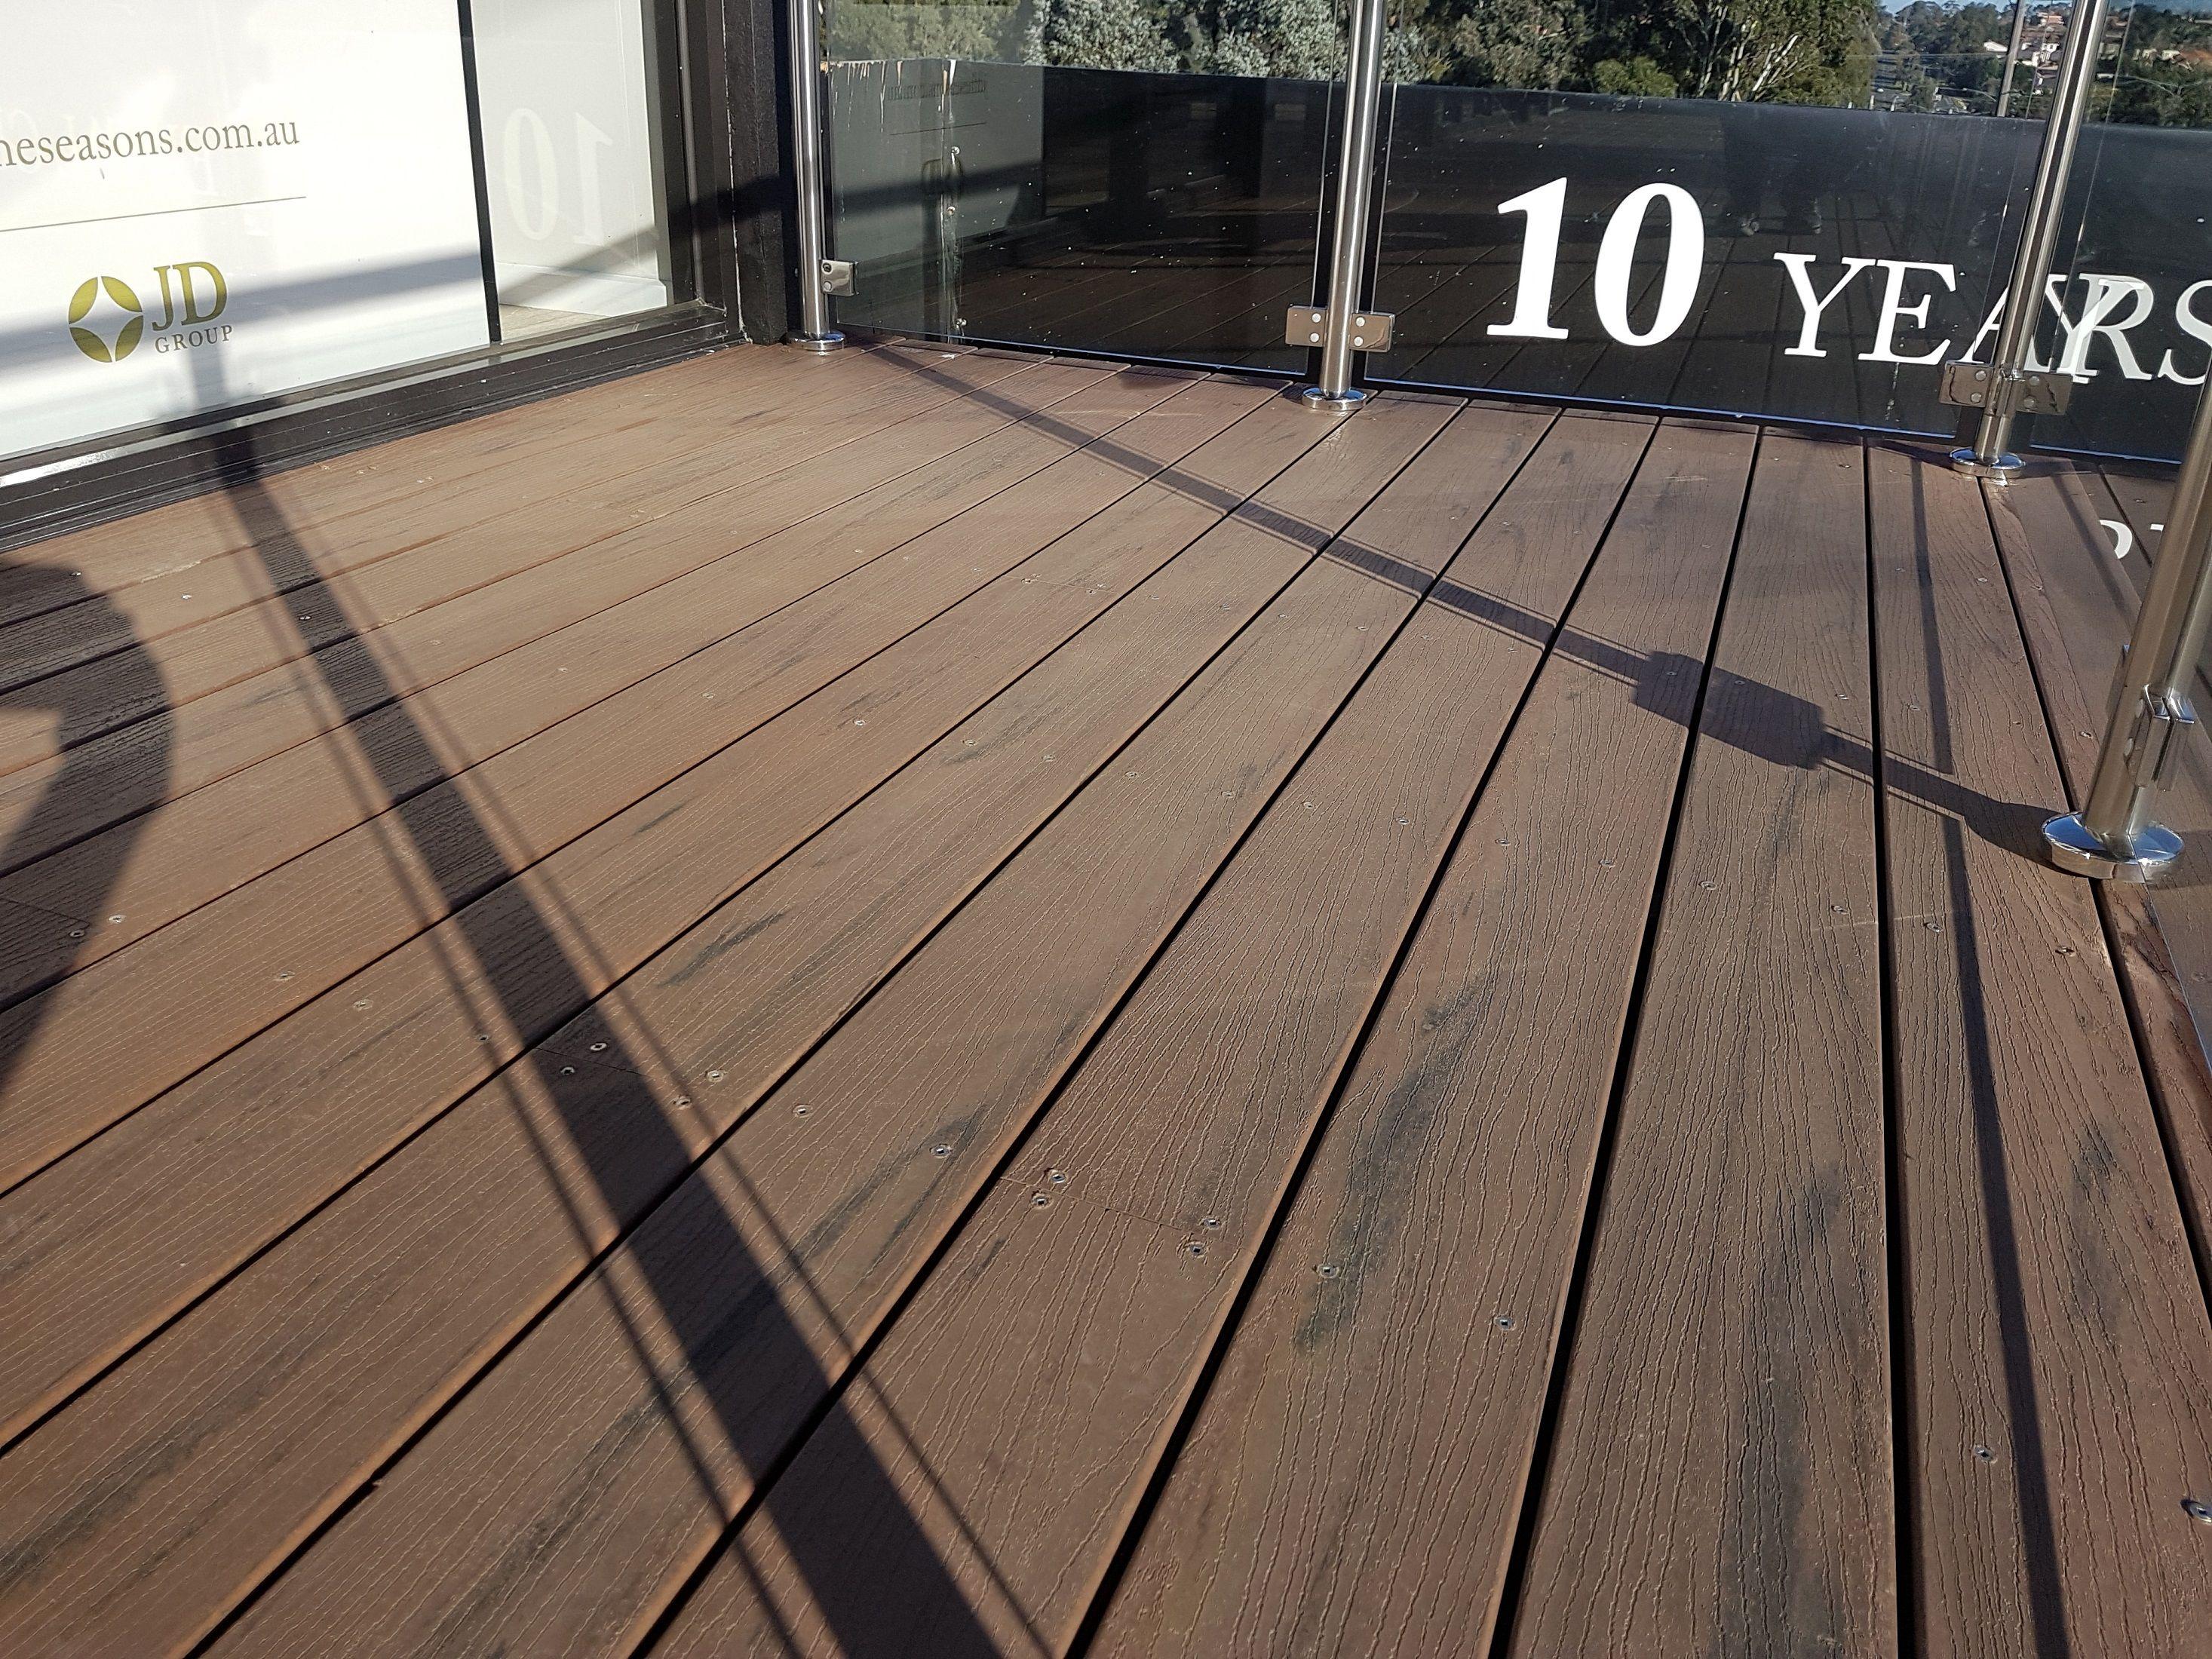 Black Bean Deckingdesigns Compositedecking Timber Deck Modwood Decking Deck